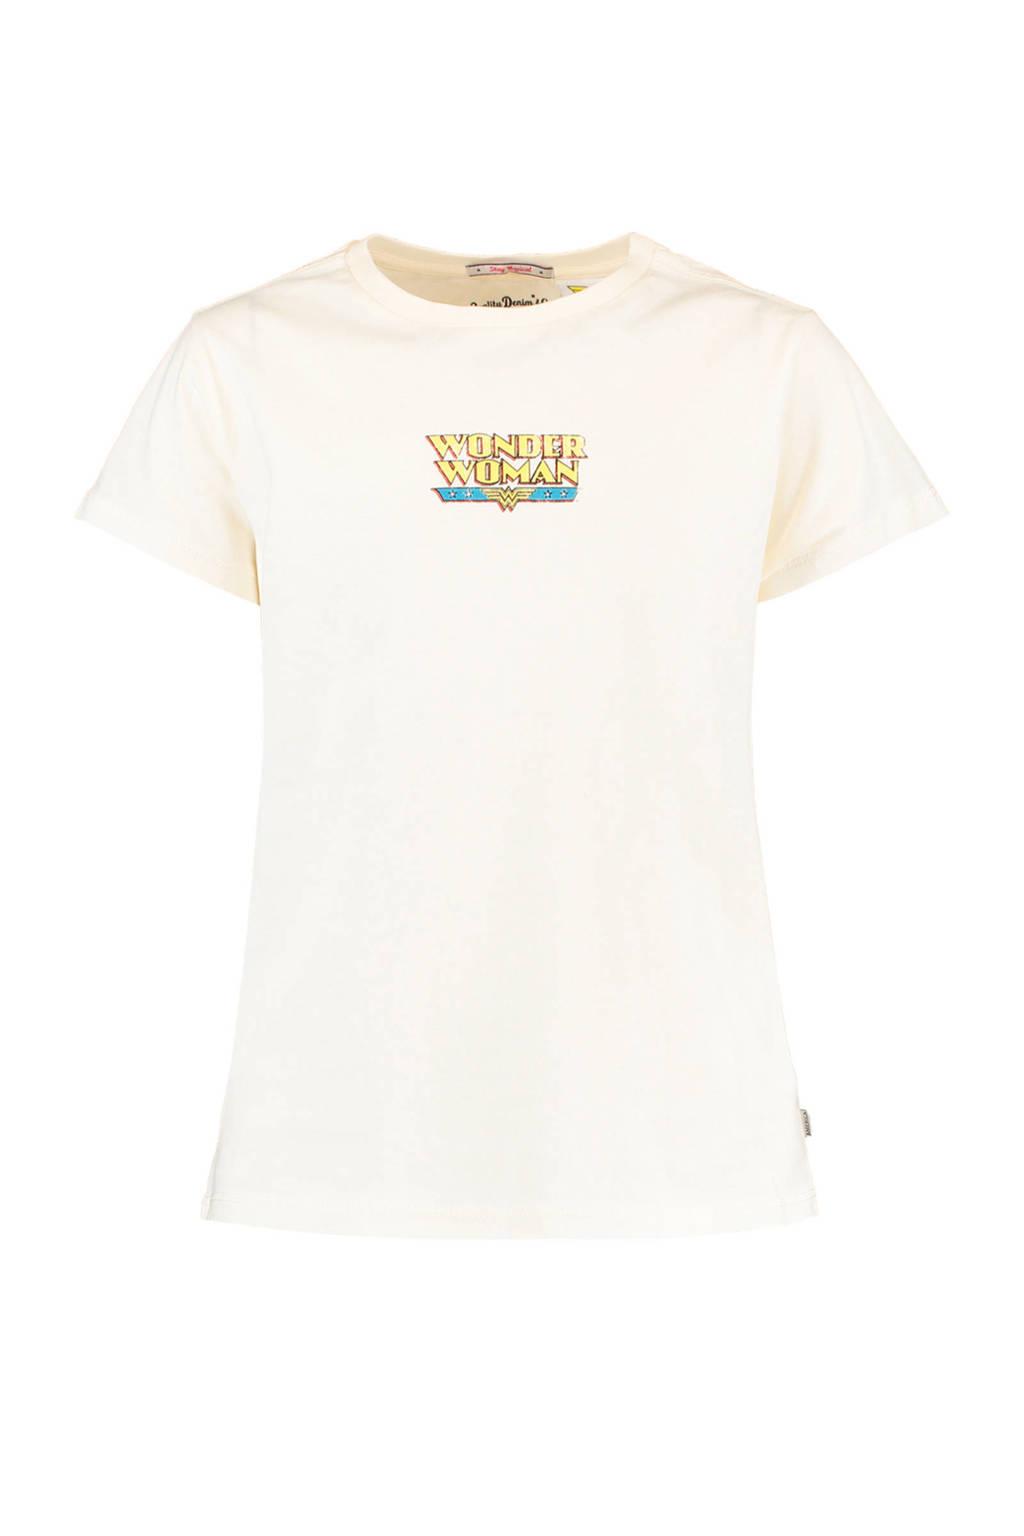 America Today Junior T-shirt met printopdruk ecru, Ecru